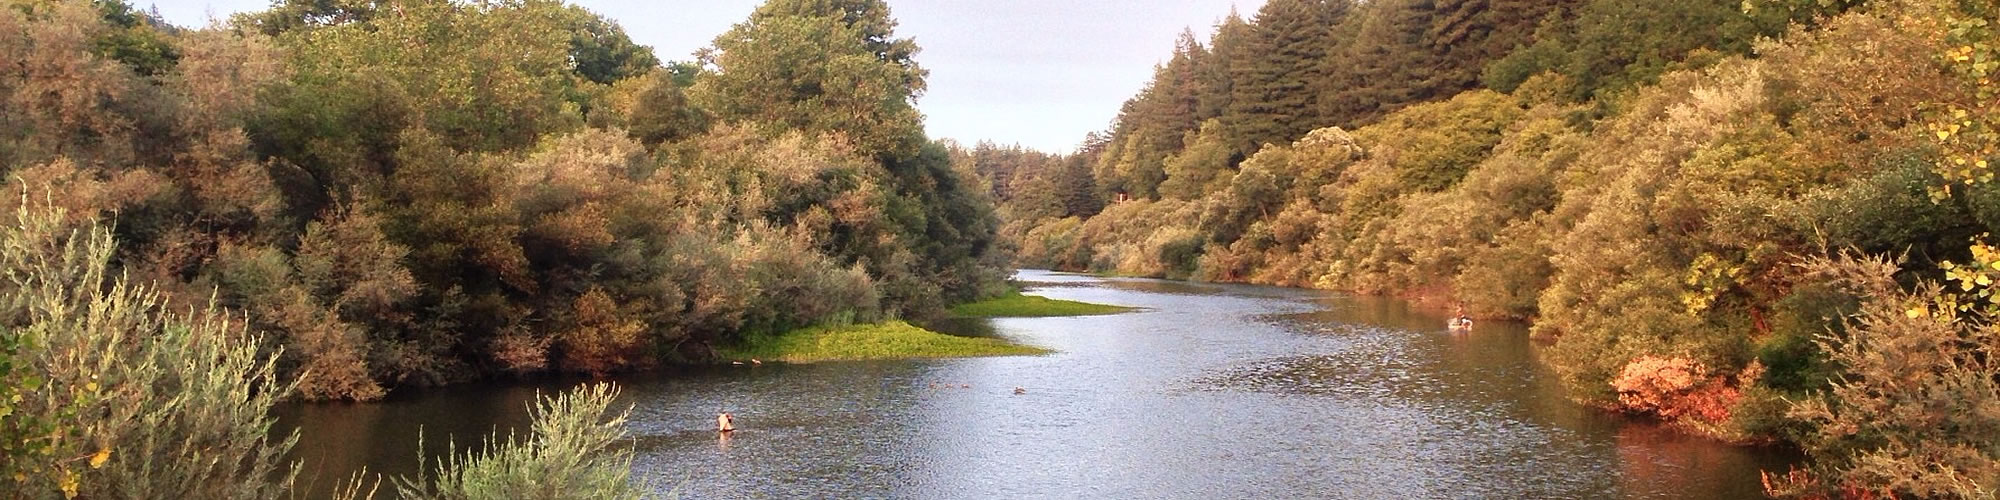 russian-river